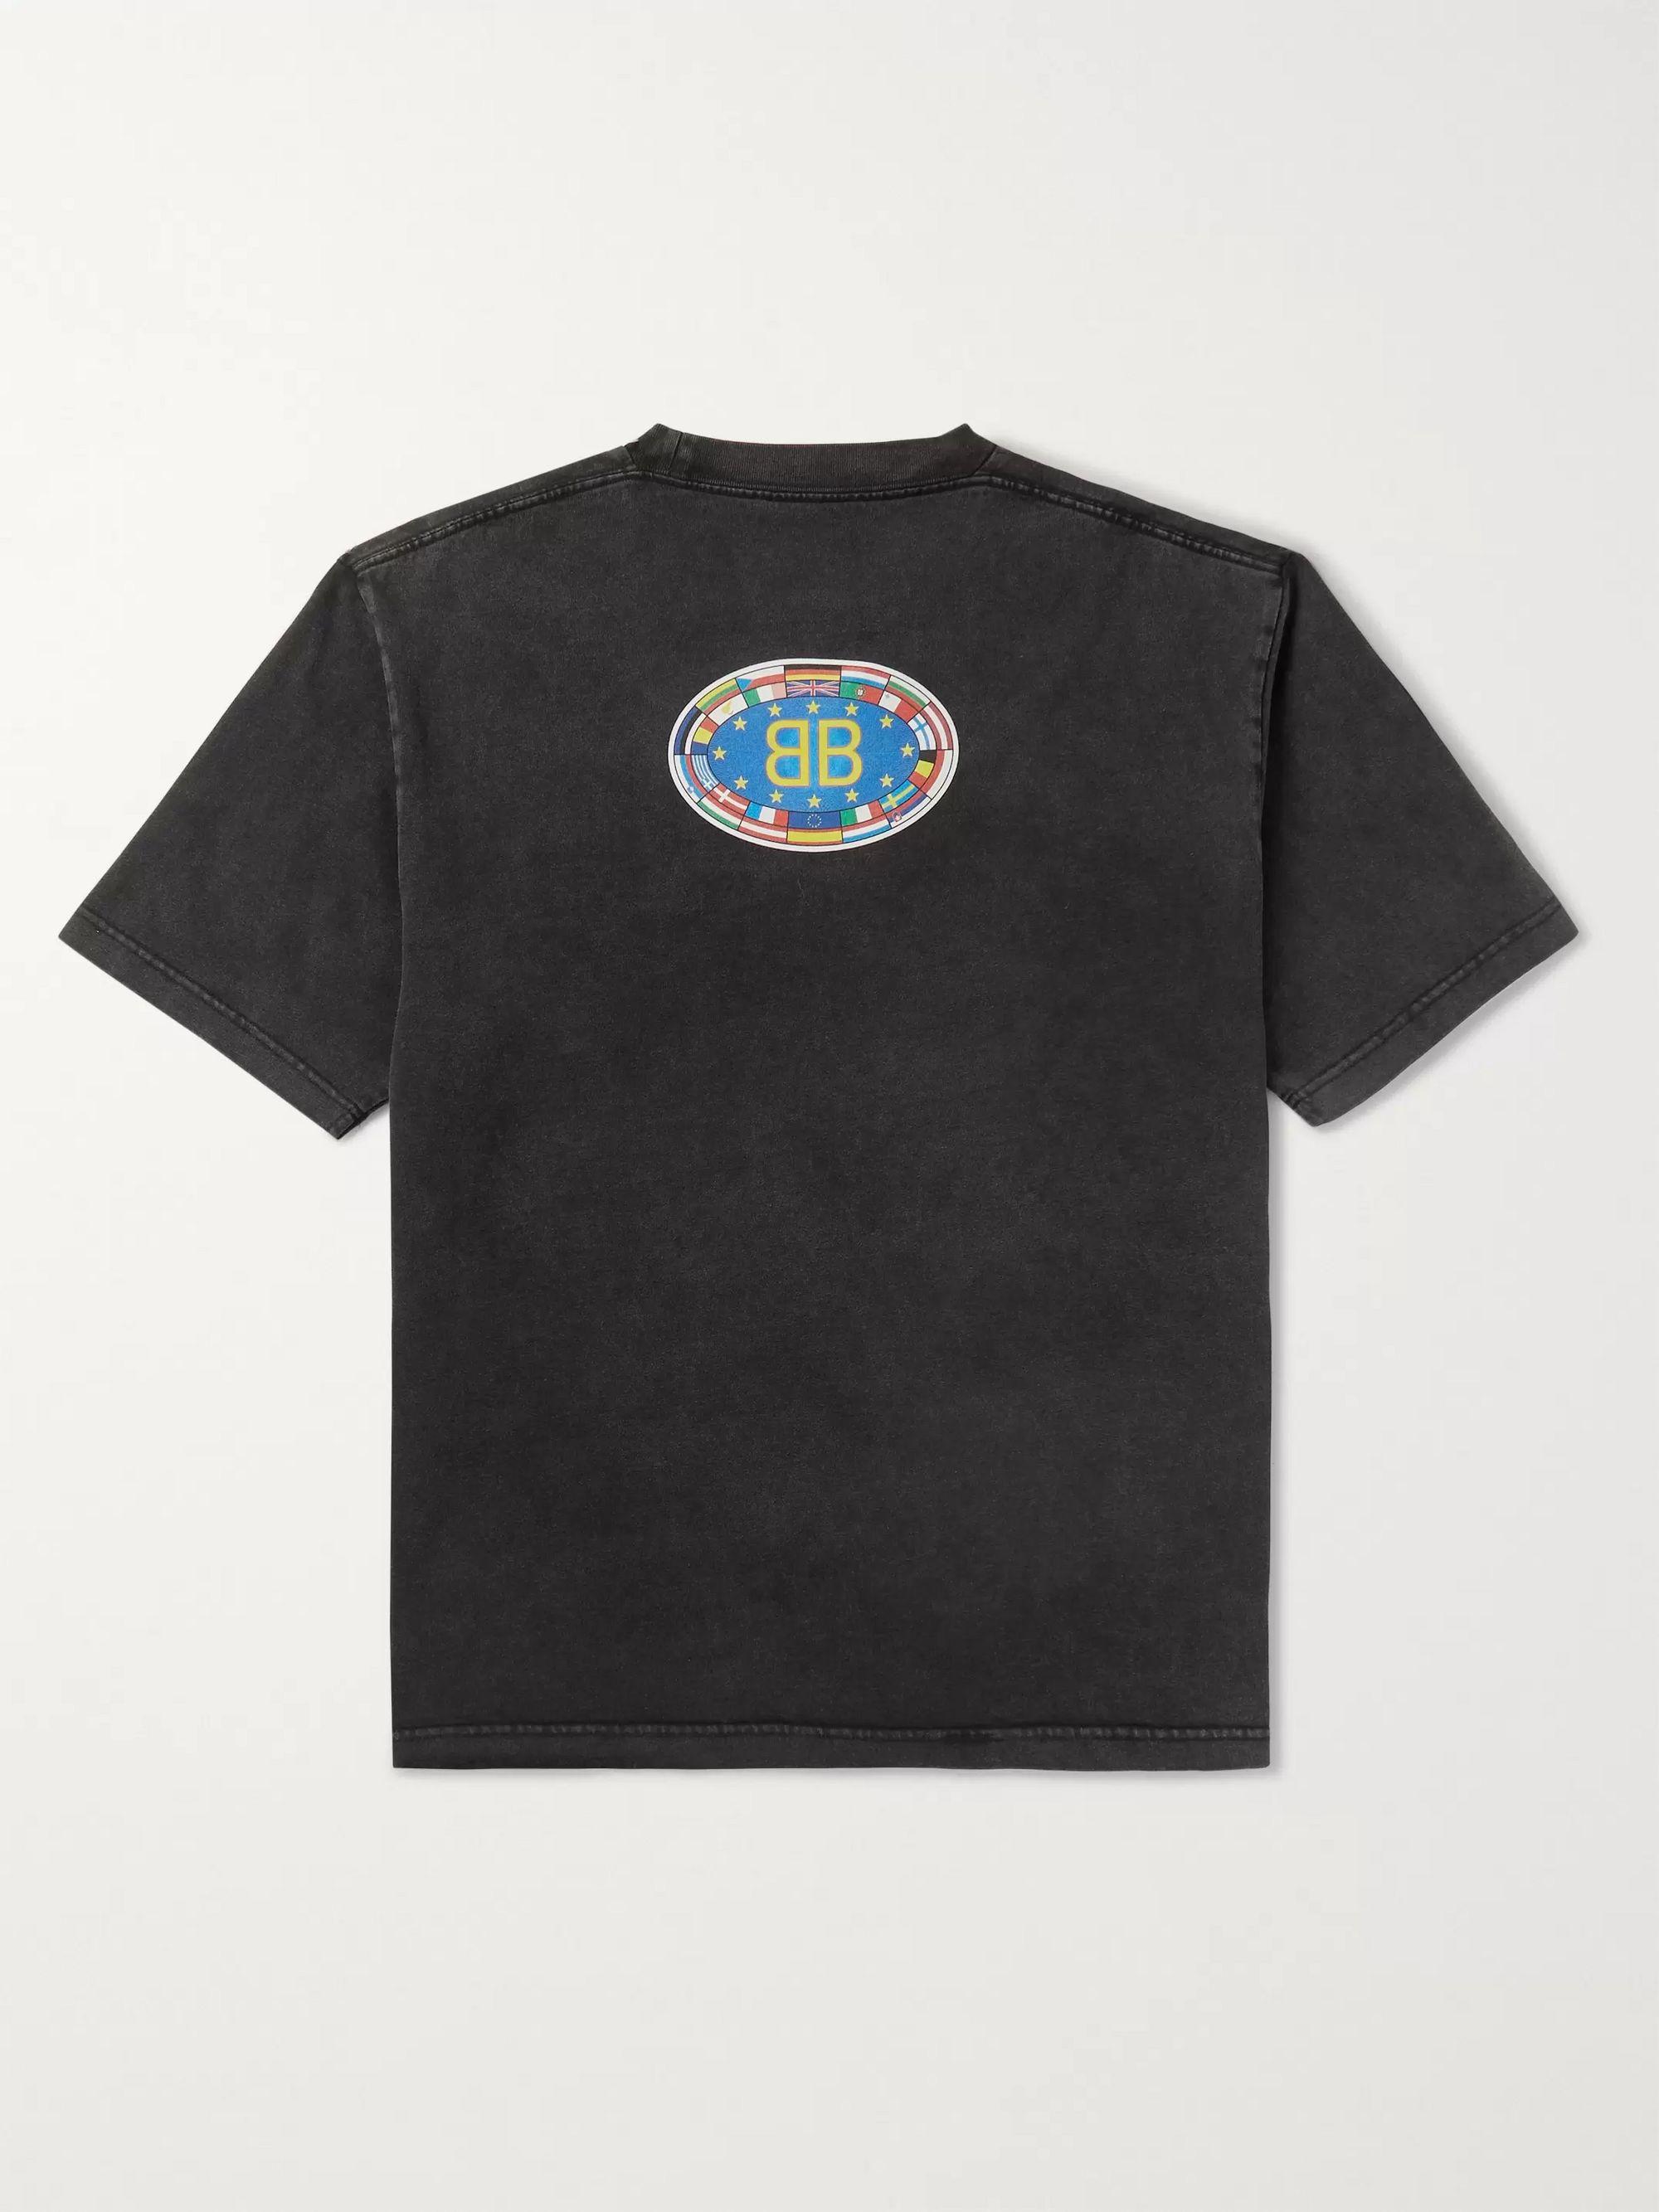 violencia Frase Querer  Light denim Logo-Embroidered Denim Jacket | Balenciaga | MR PORTER